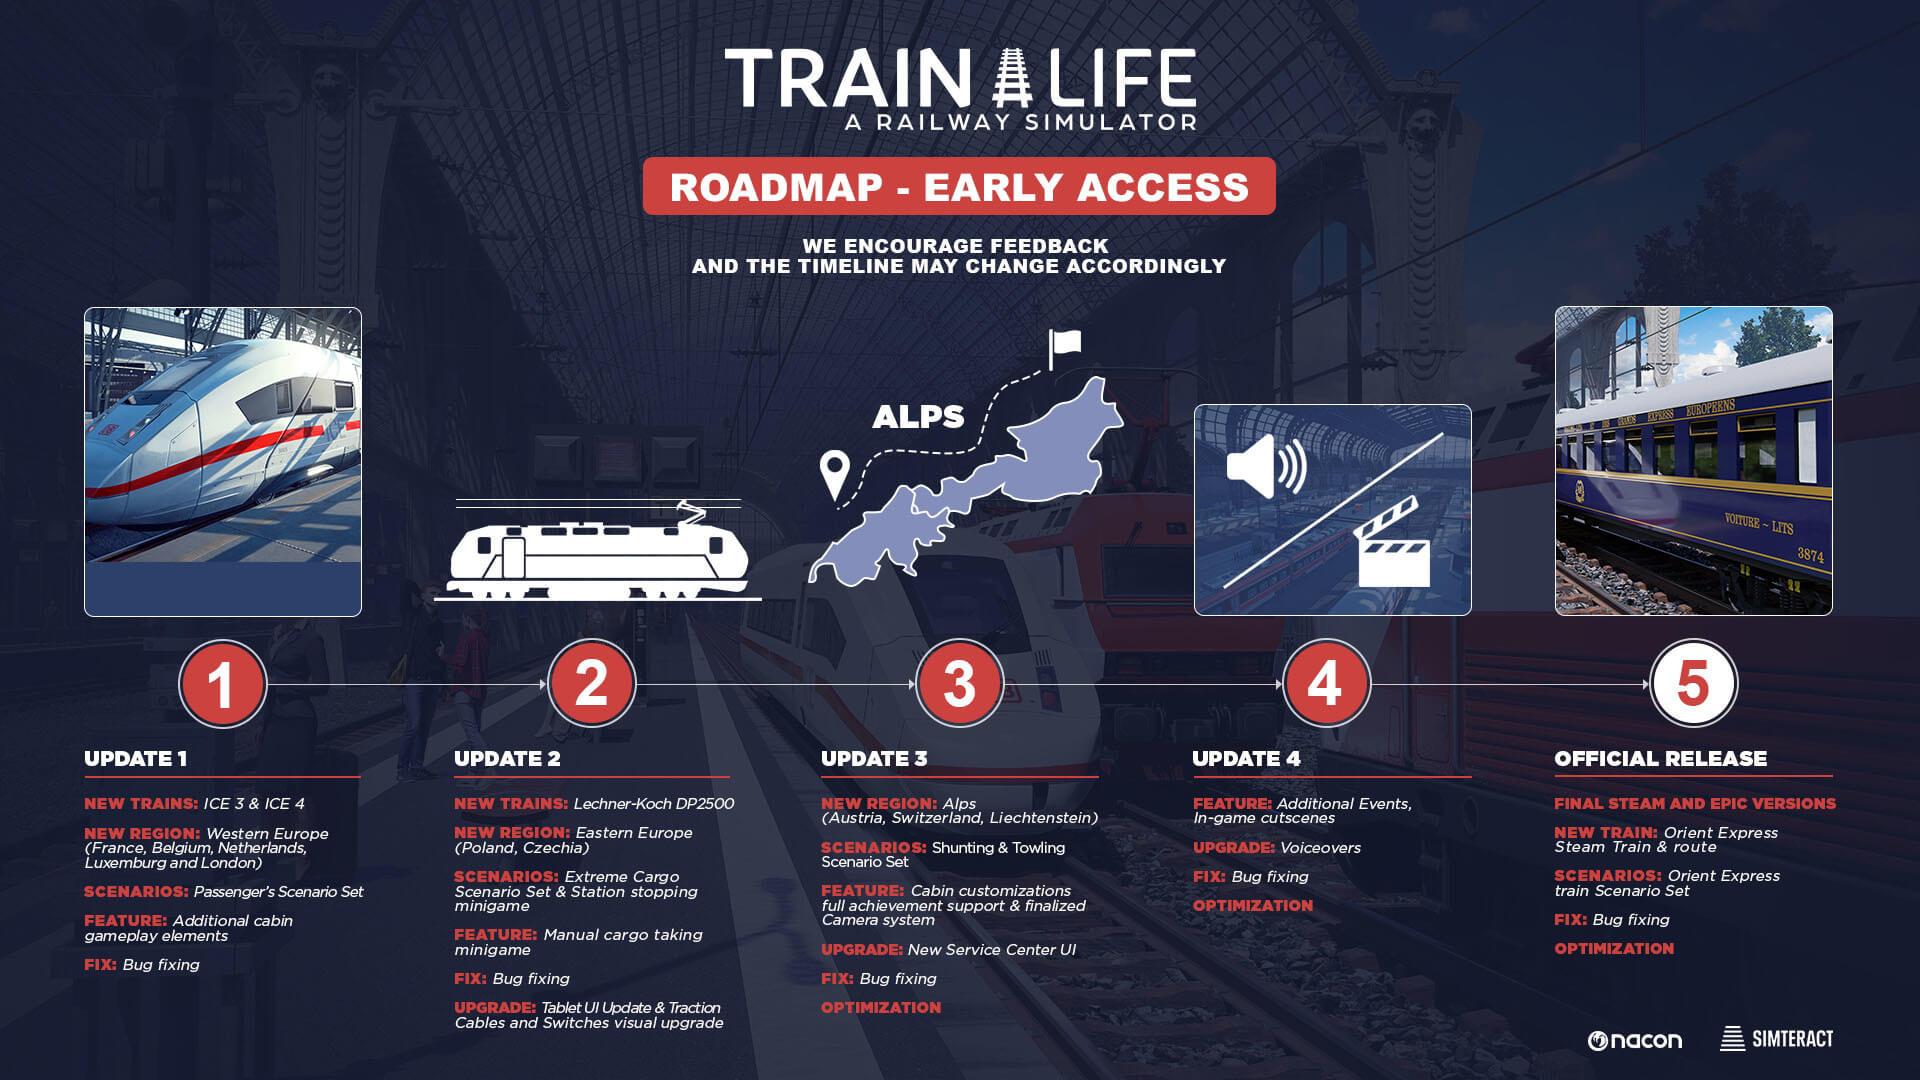 trainlife roadmap